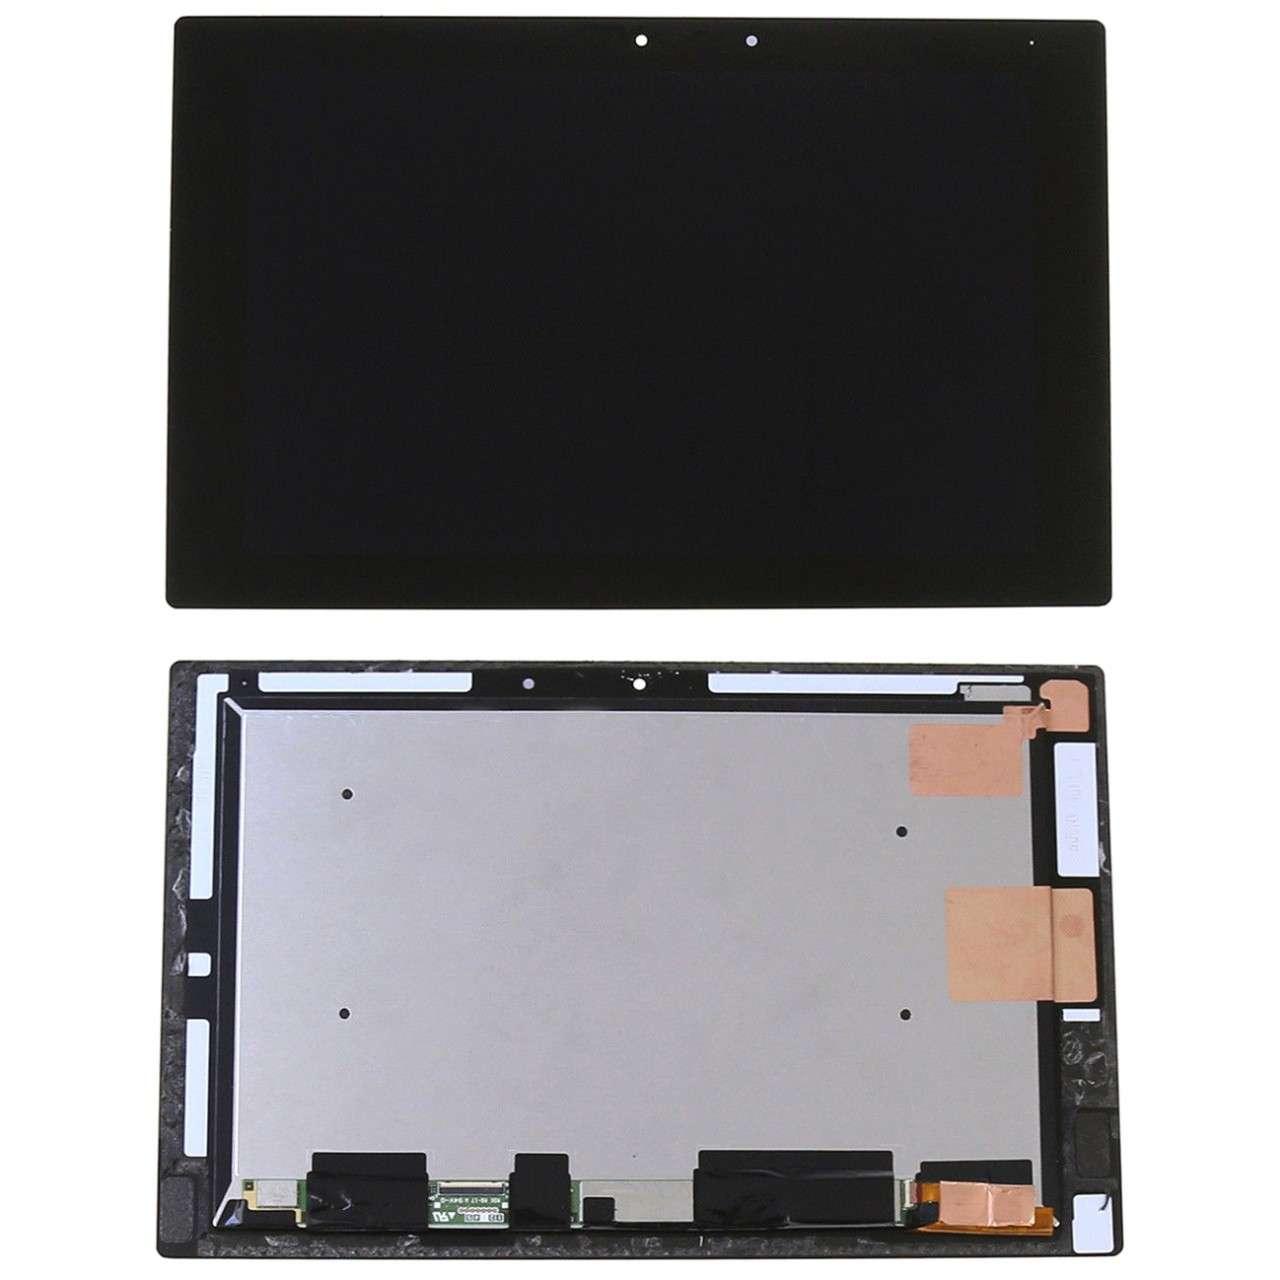 Ansamblu LCD Display Touchscreen Sony Xperia Z2 Tablet SGP511 WiFi imagine powerlaptop.ro 2021